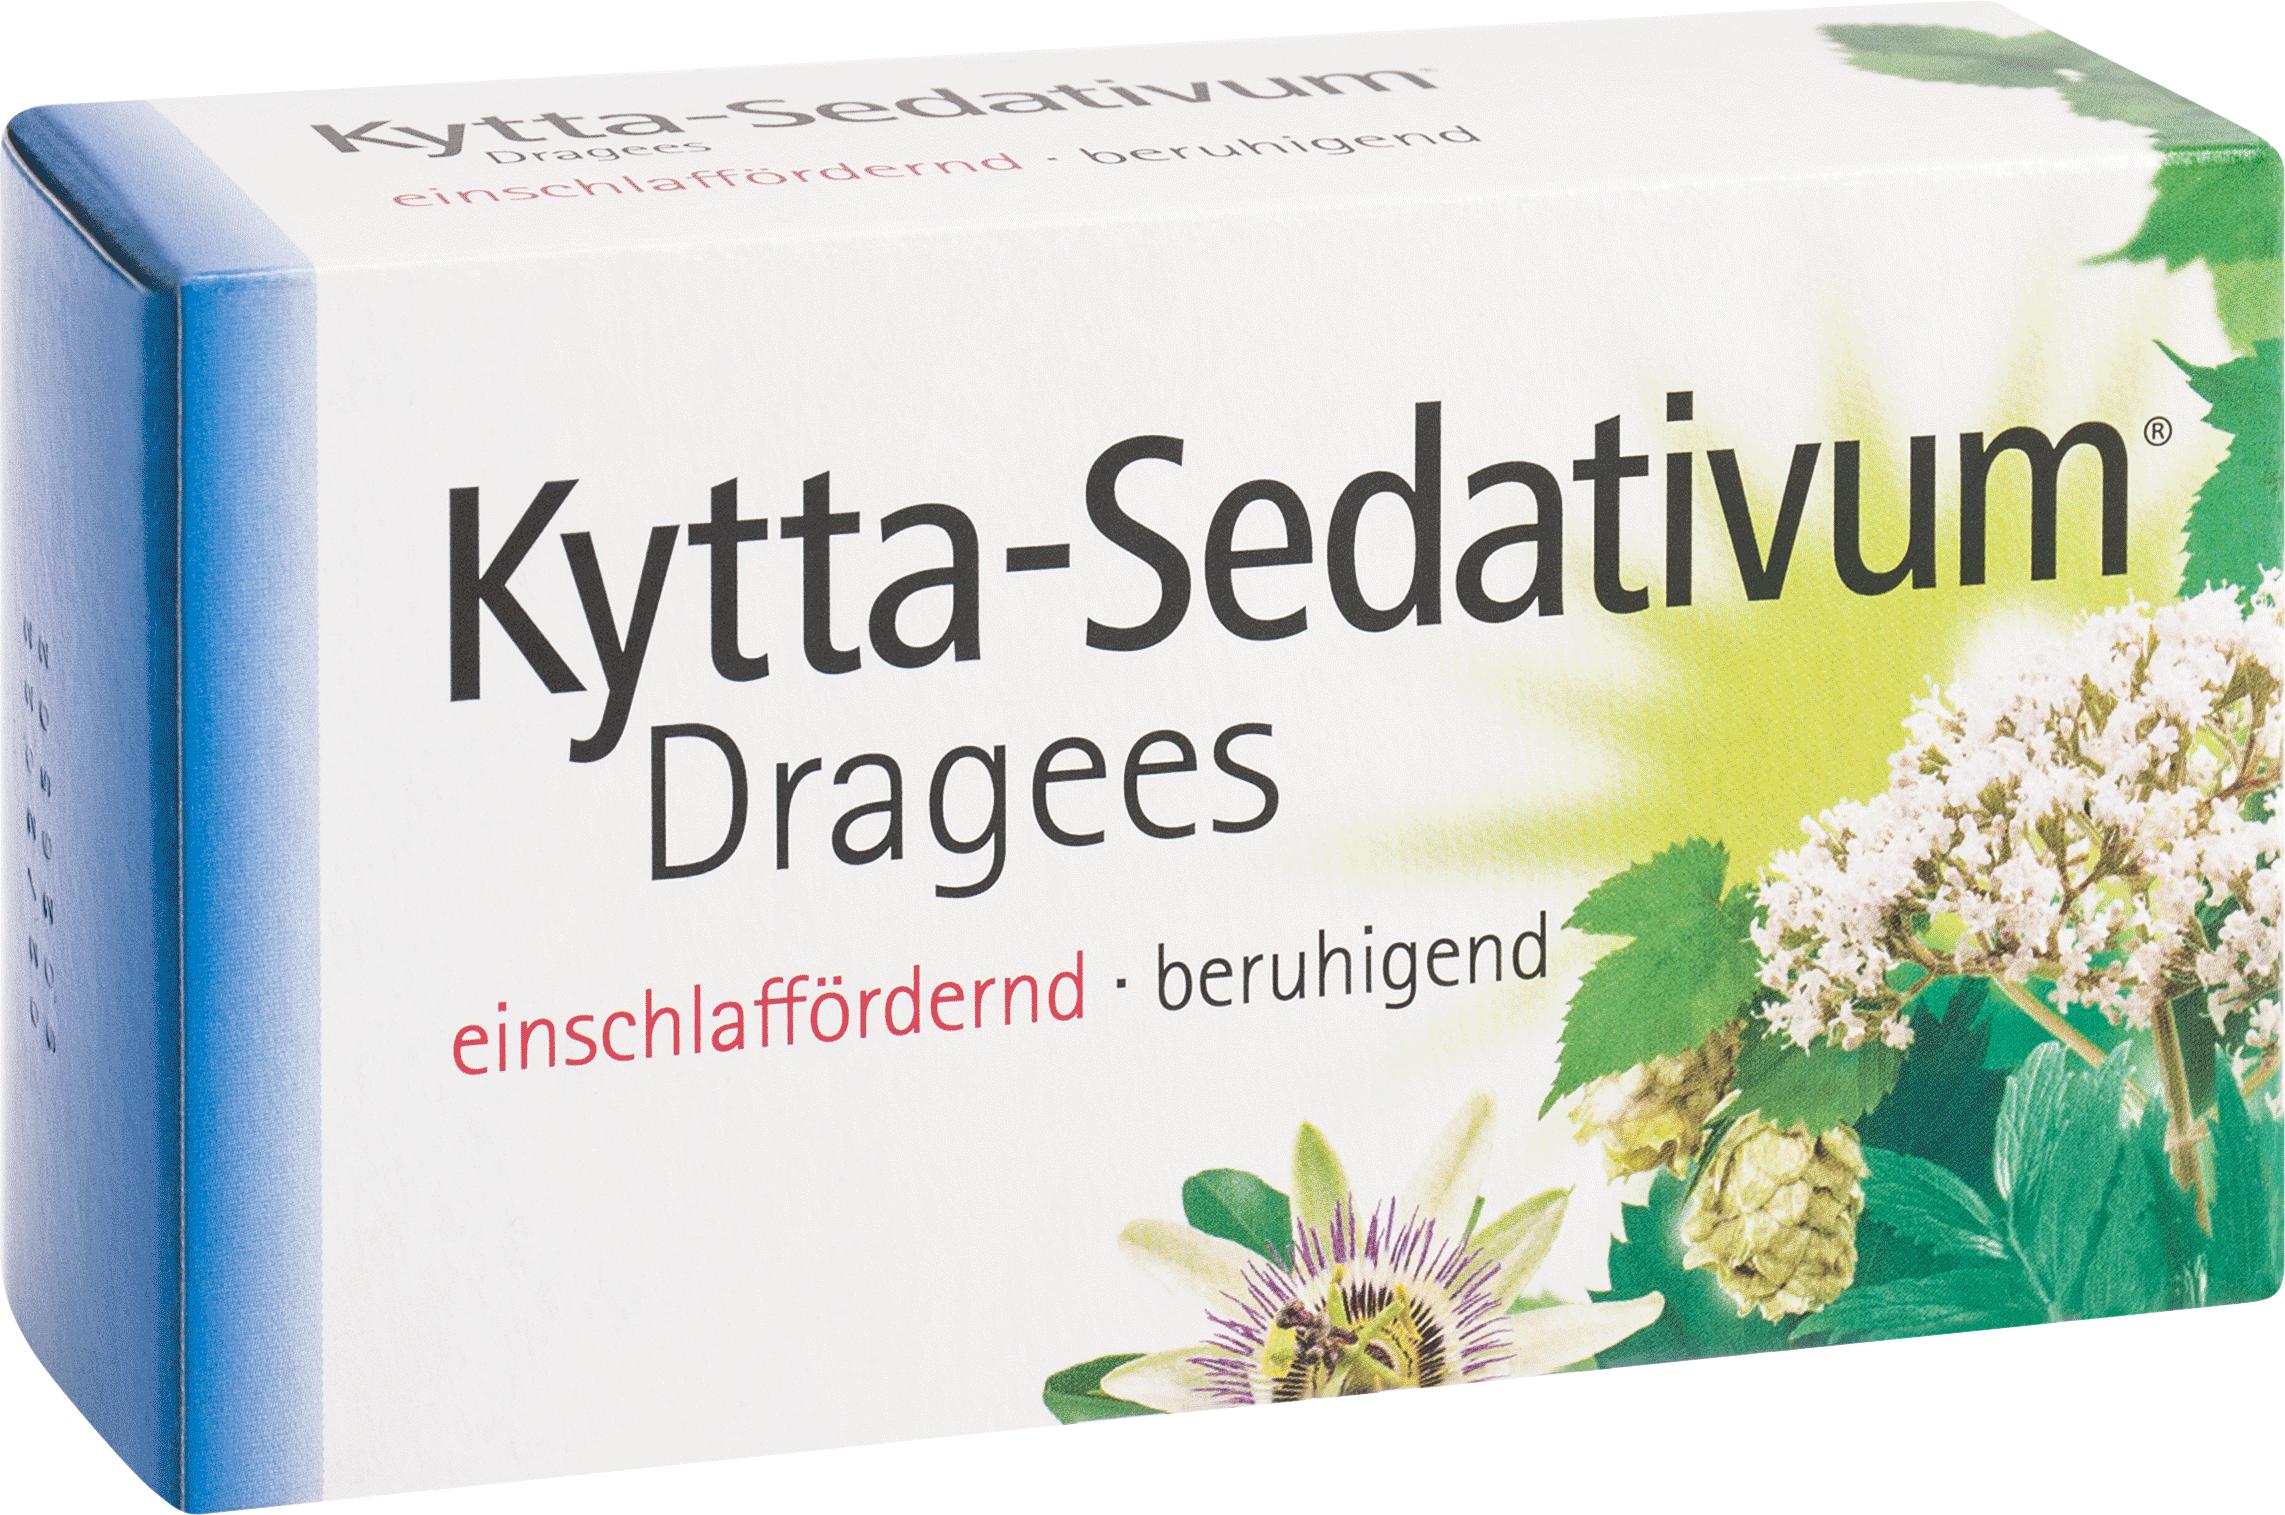 Kytta-Sedativum Dragees